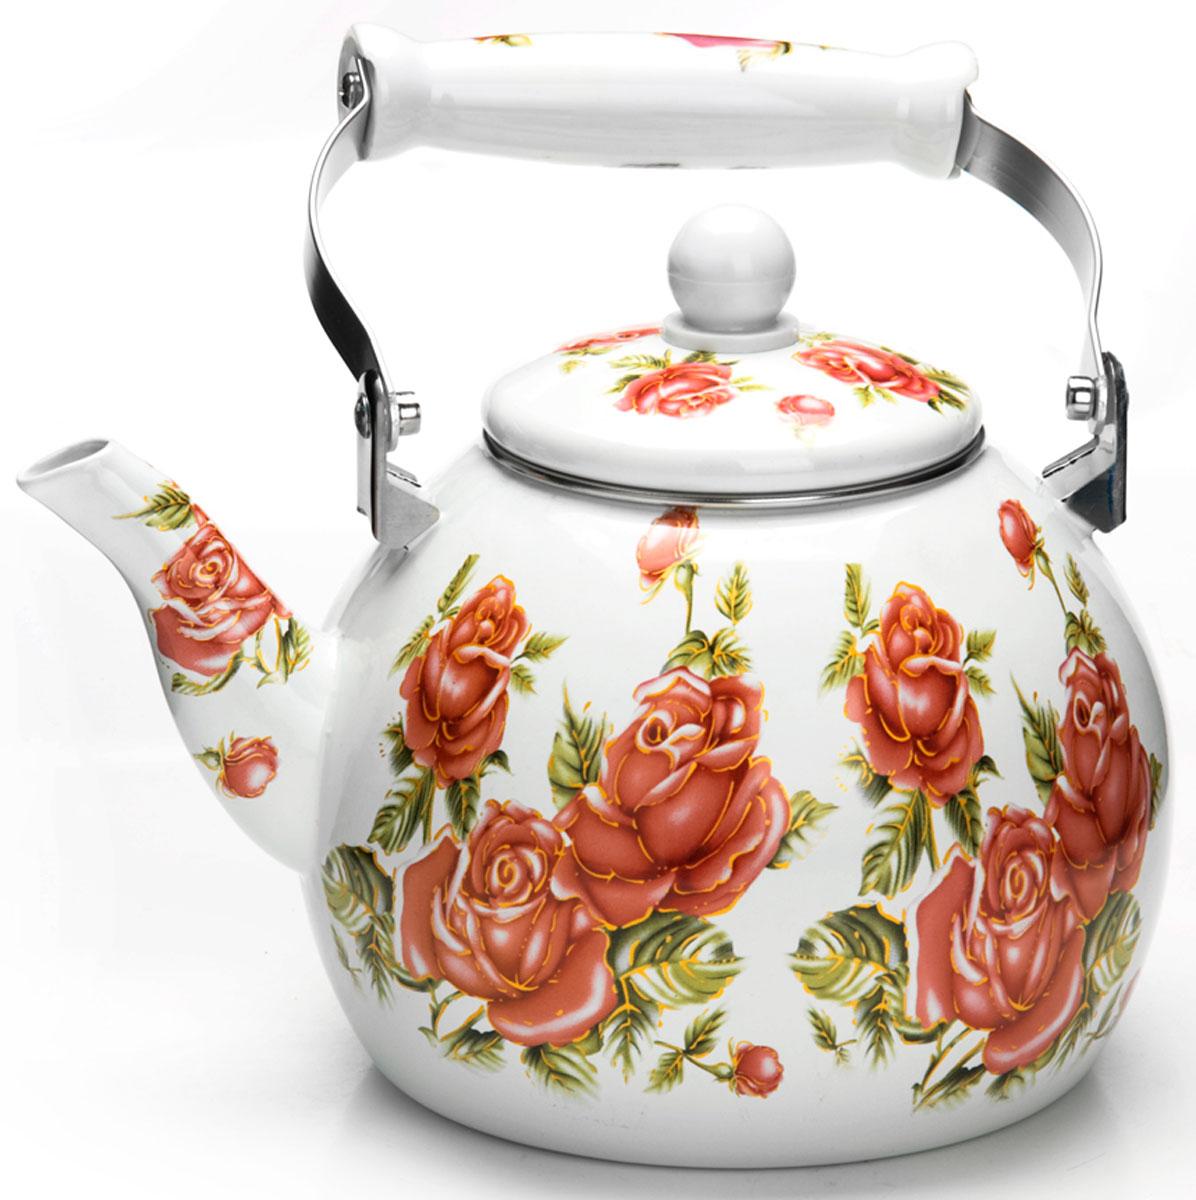 Чайник Mayer & Boch Цветы, 3 л. 2649626496